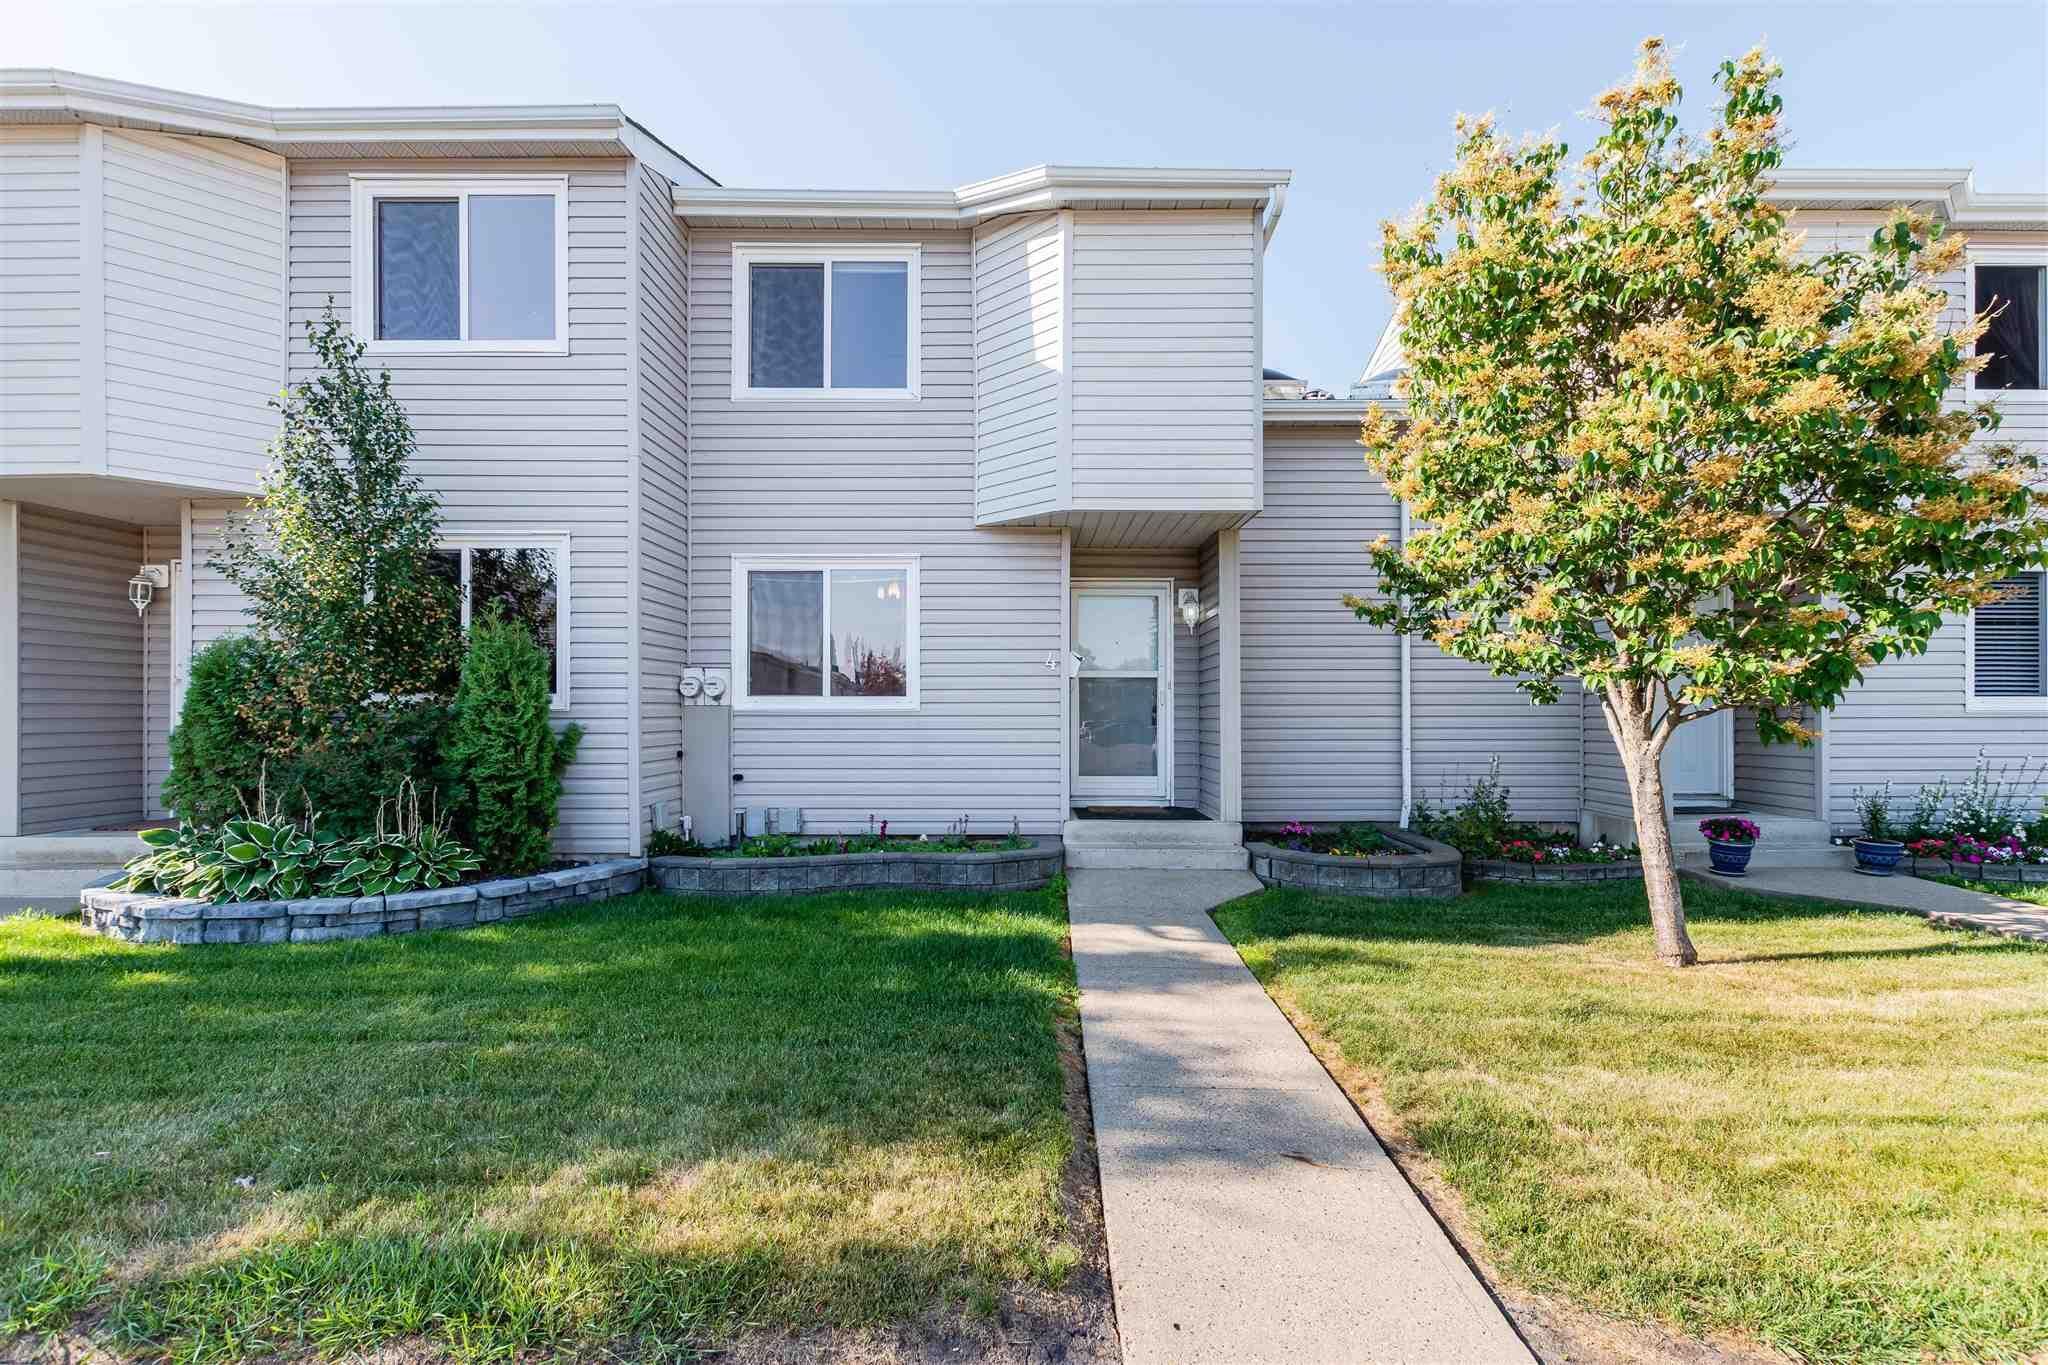 Main Photo: 4 3221 119 Street in Edmonton: Zone 16 Townhouse for sale : MLS®# E4254079